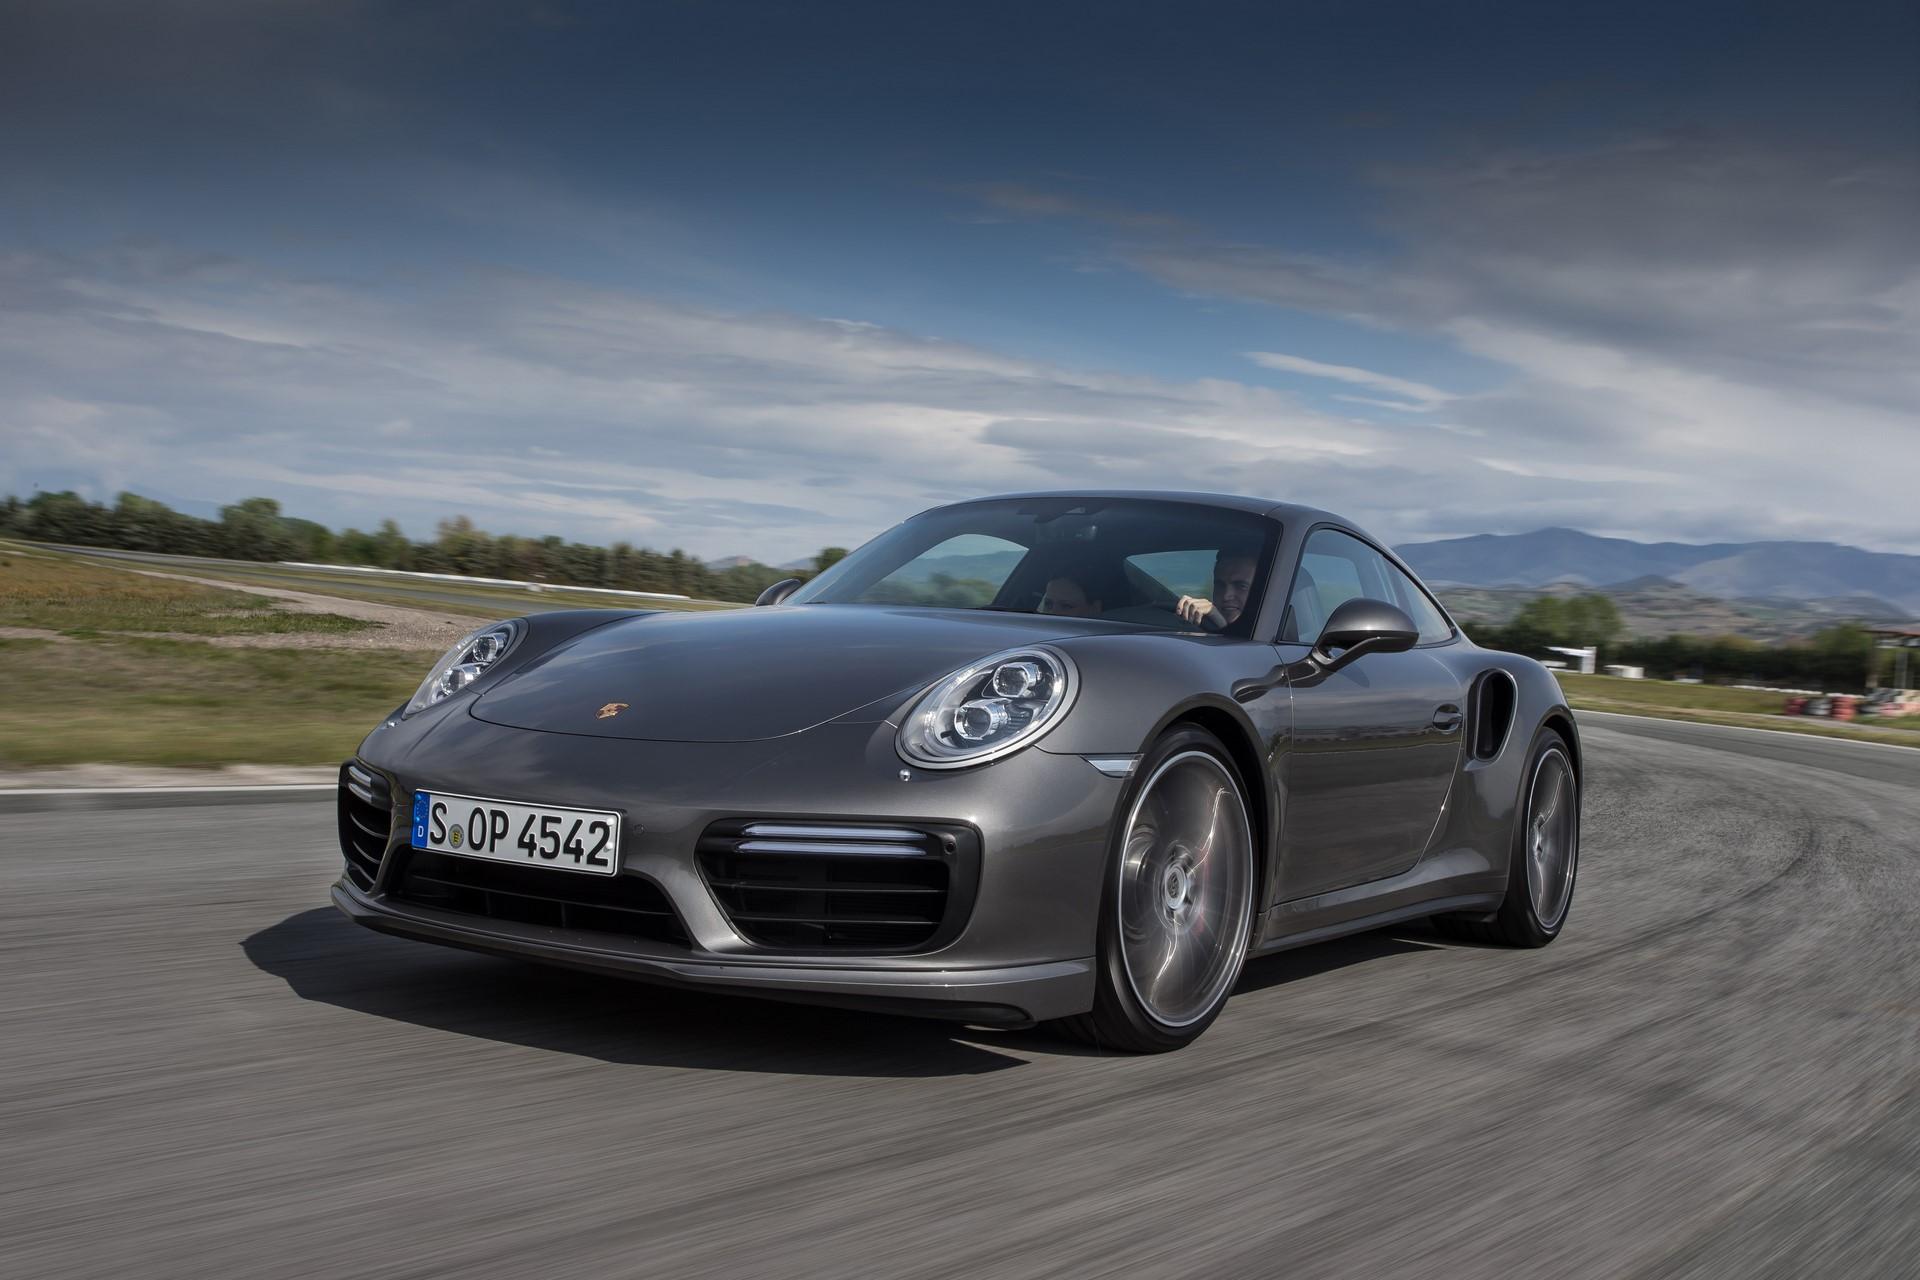 Porsche Driving Experience 2017 Serres (30)